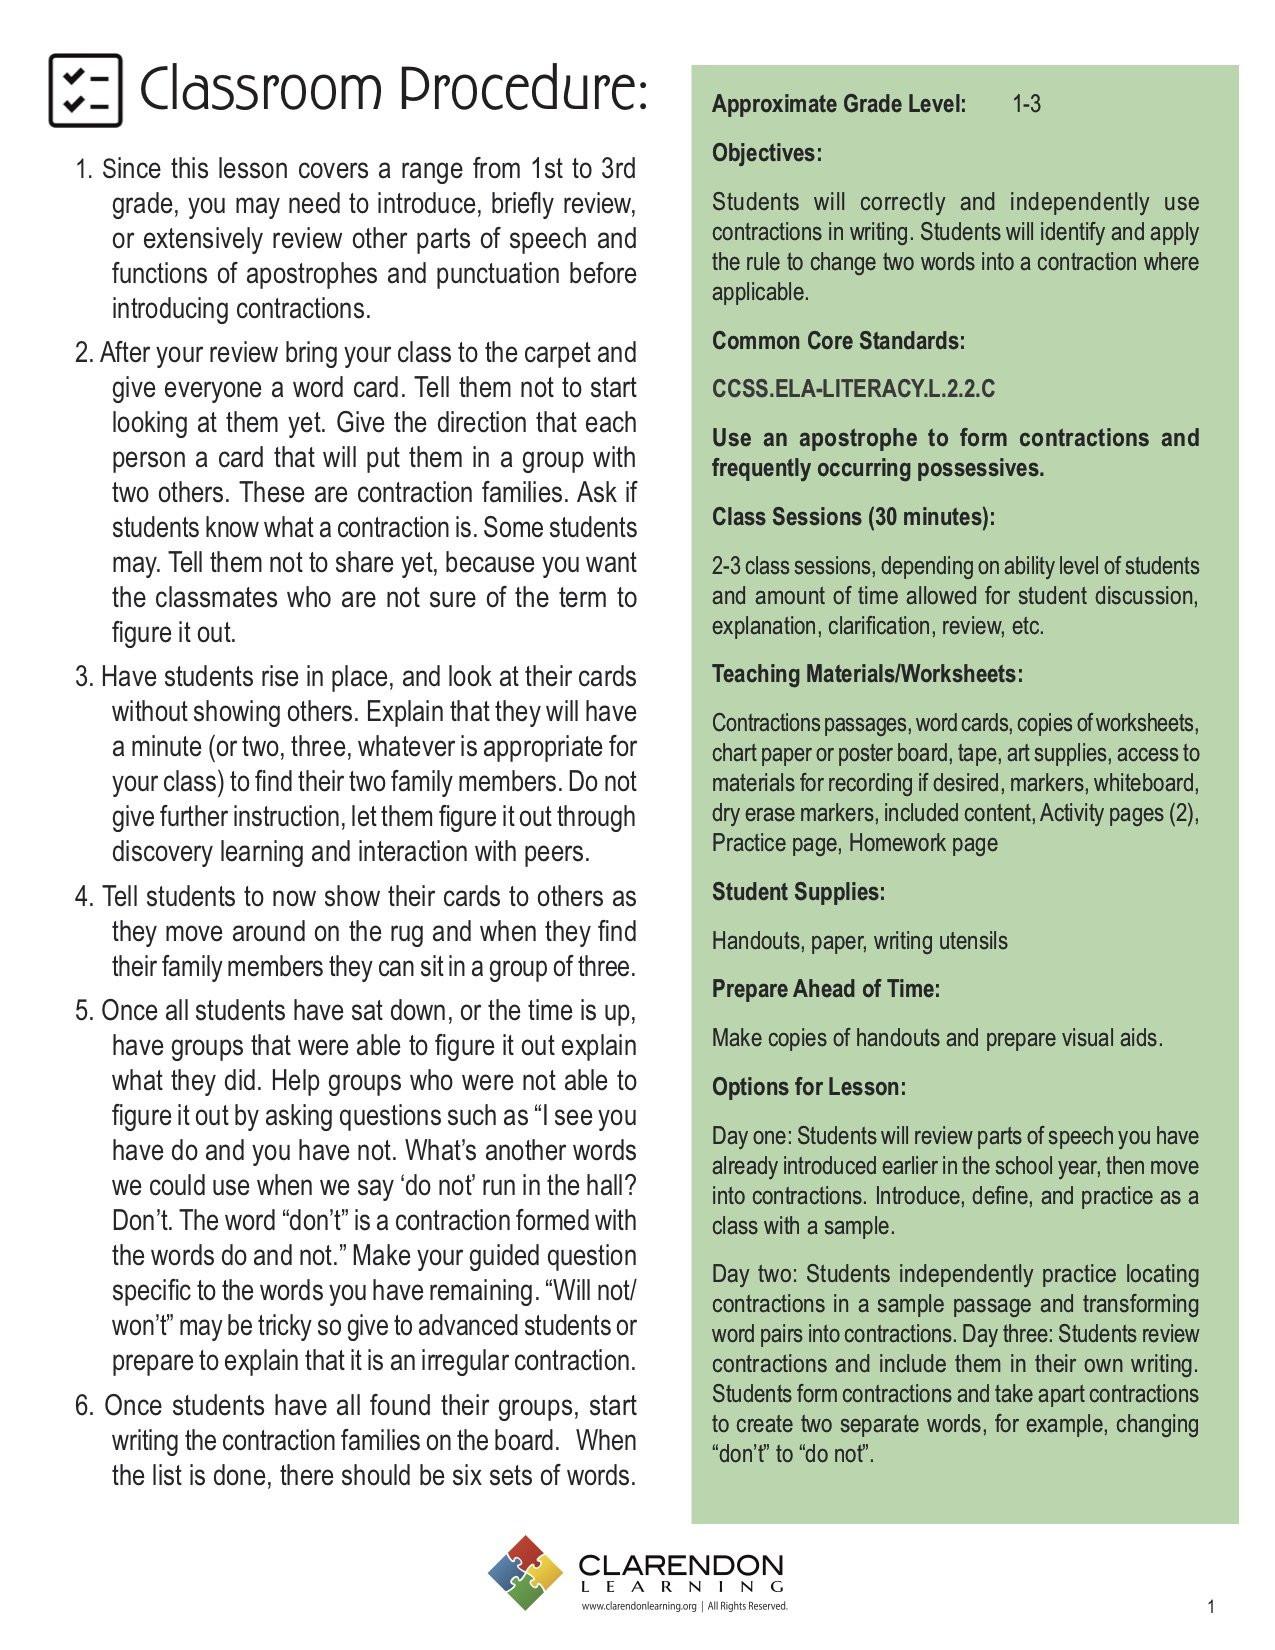 Contractions Worksheet 3rd Grade Contractions